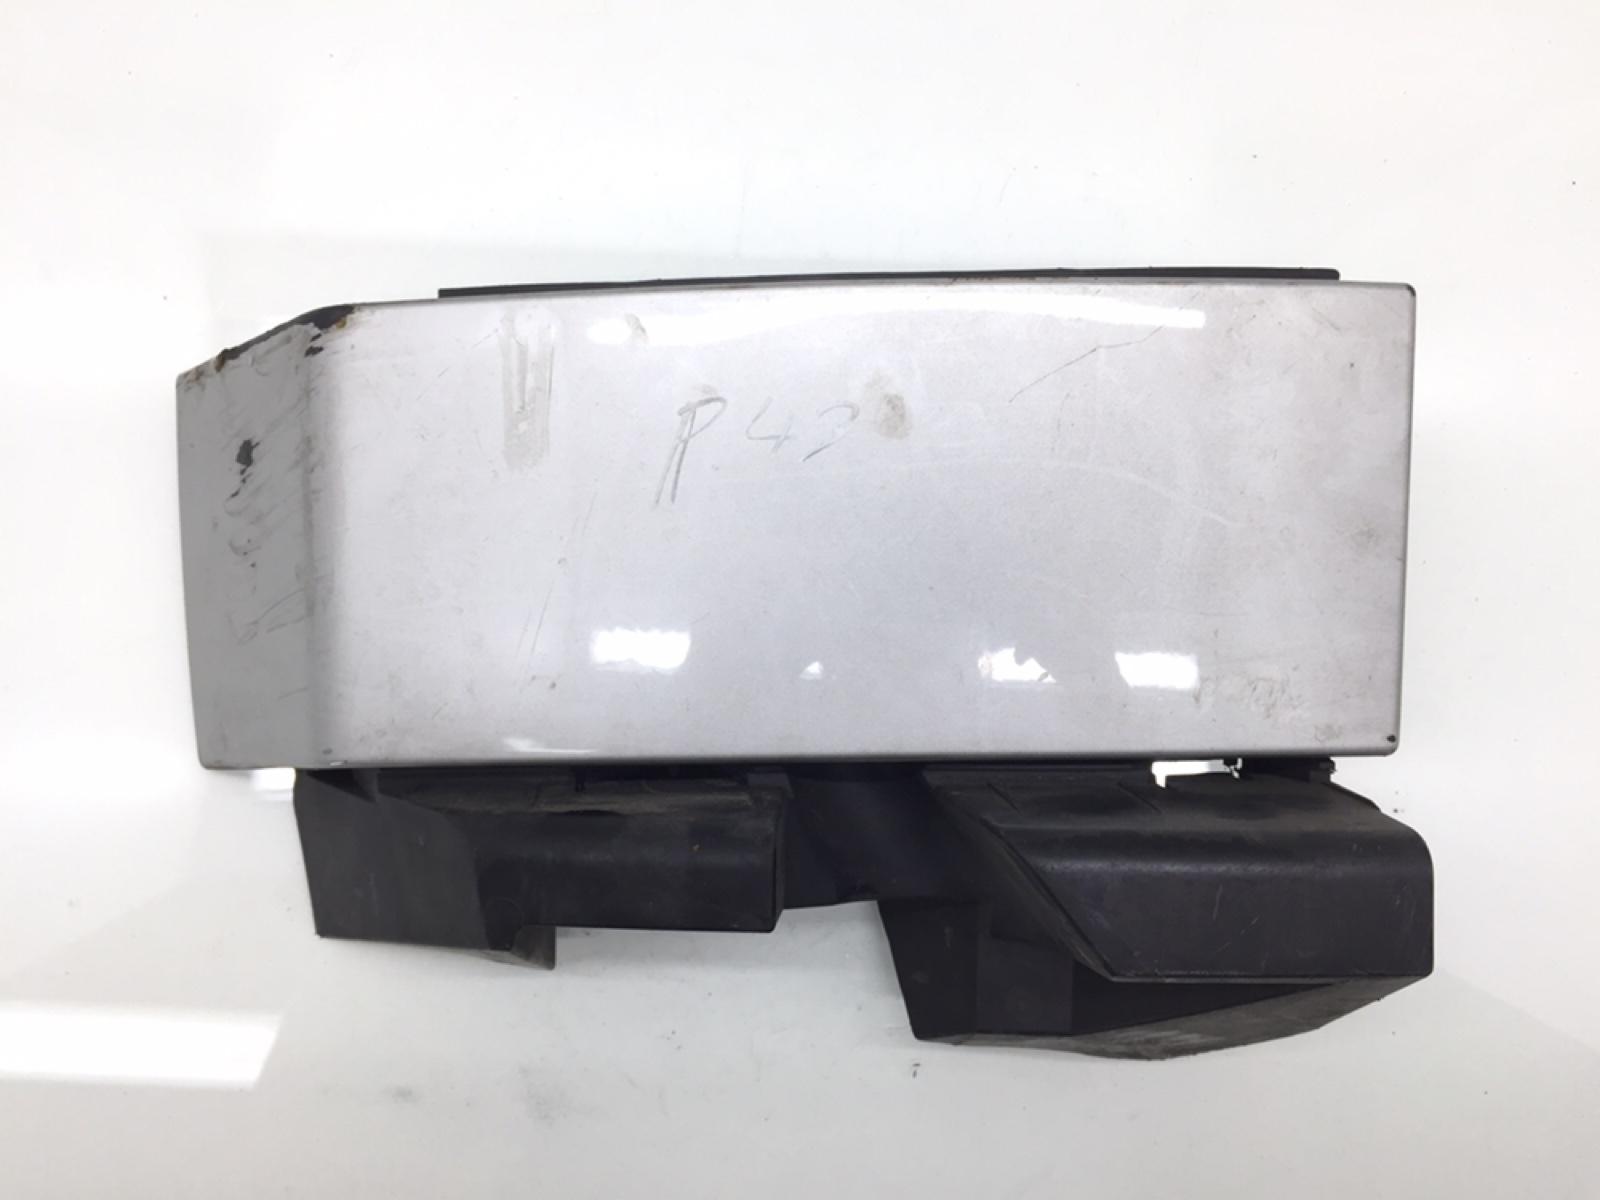 Кронштейн крепления бампера заднего Volvo Xc90 2.4 D5 2005 (б/у)